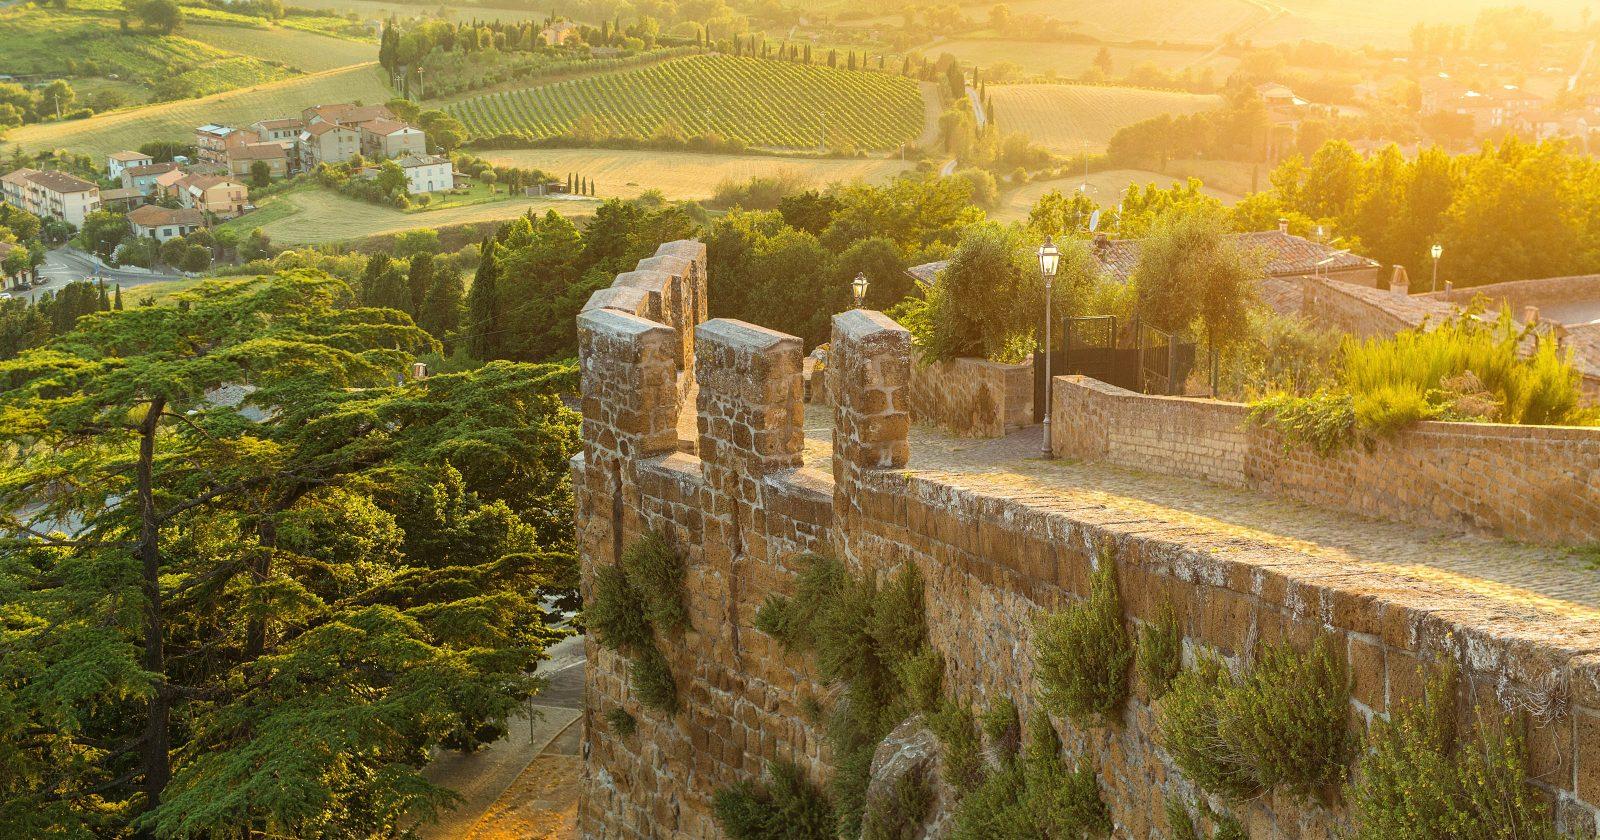 Our Italian Honeymoon: Orvieto, Florence, & Cinque Terre